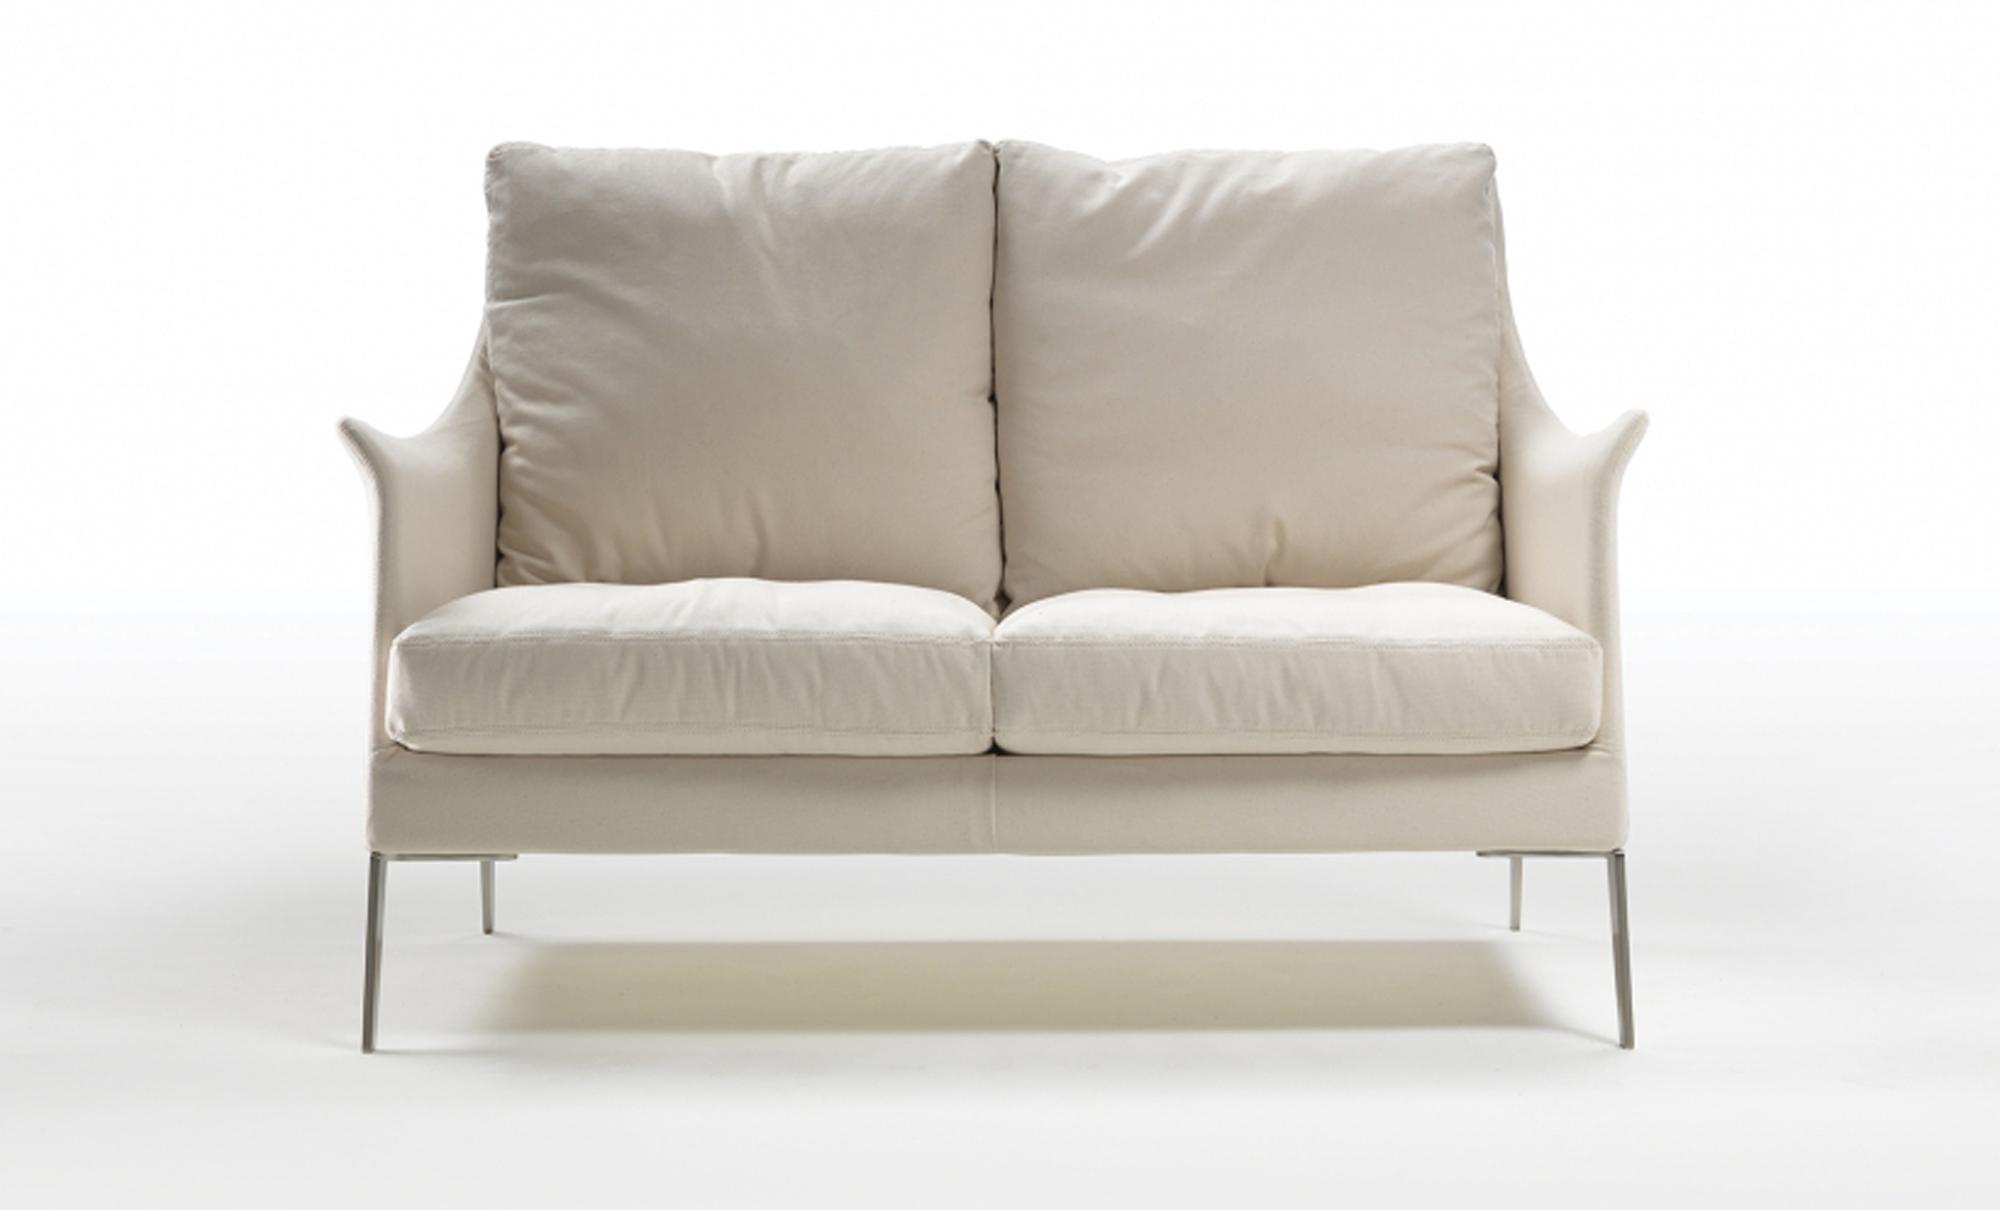 Designer Sofas and Couches Sydney & Melbourne Fanuli Furniture